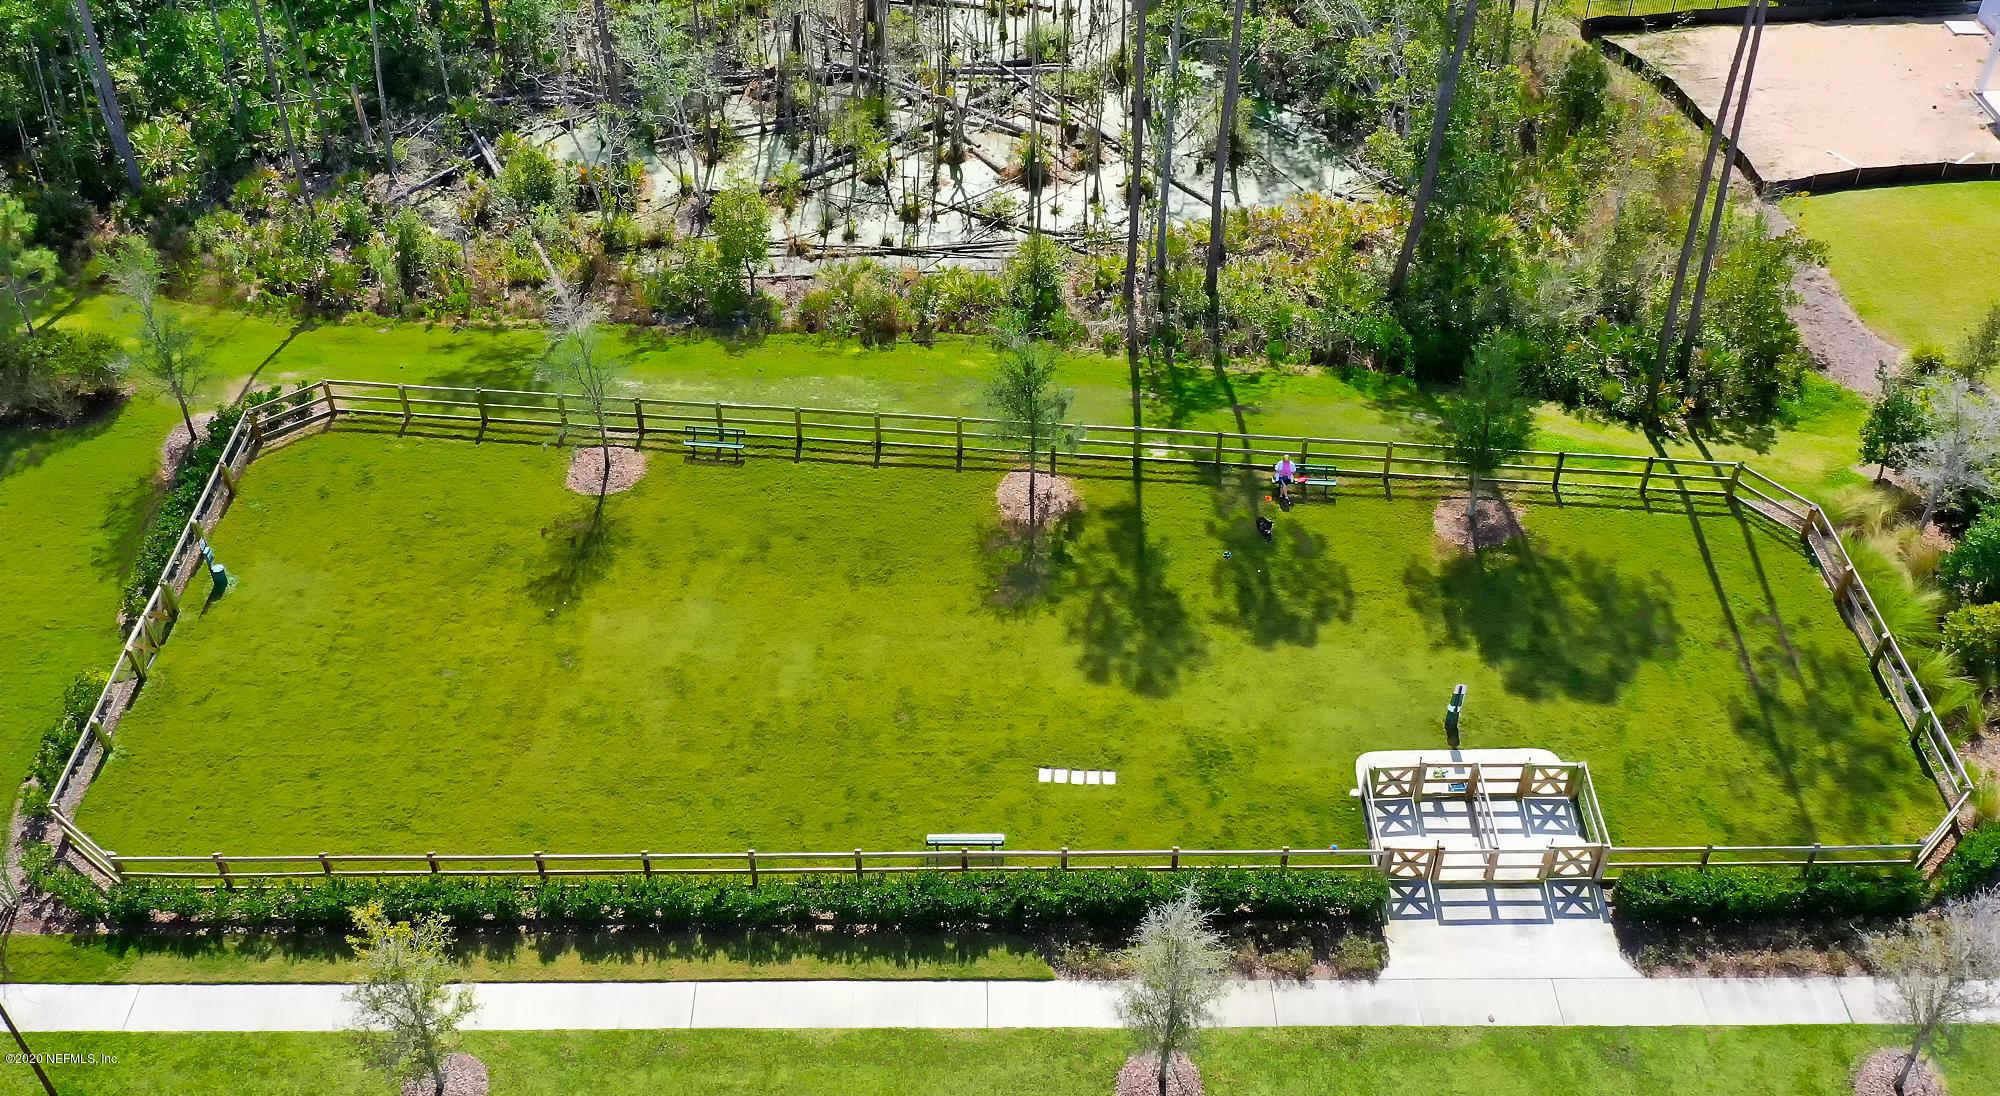 48 FESTING GROVE, JACKSONVILLE, FLORIDA 32081, 4 Bedrooms Bedrooms, ,3 BathroomsBathrooms,Residential,For sale,FESTING GROVE,1039196